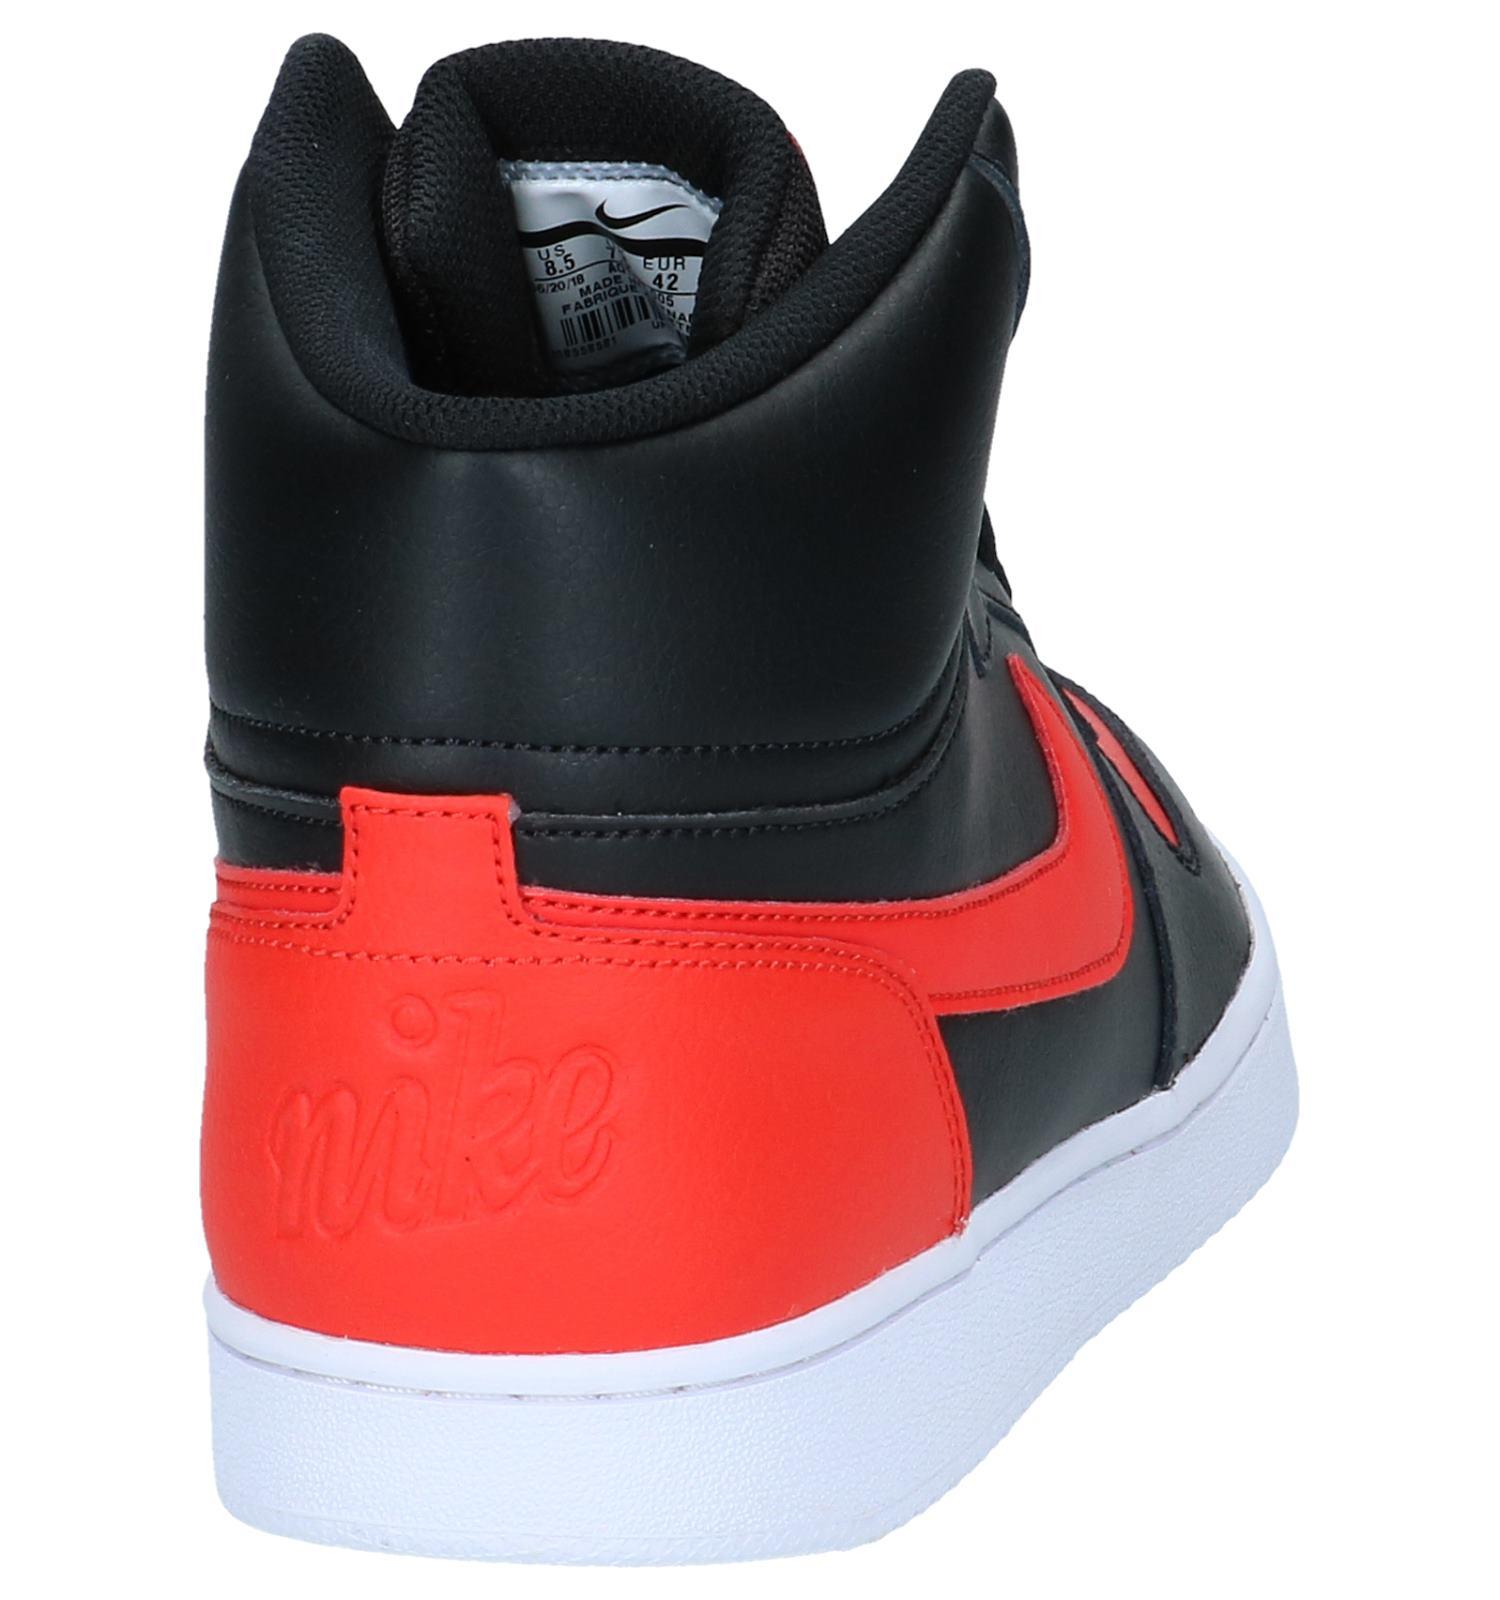 the latest 325d8 65c3d Zwart Rode Sneakers Nike Ebernon Mid   TORFS.BE   Gratis verzend en retour